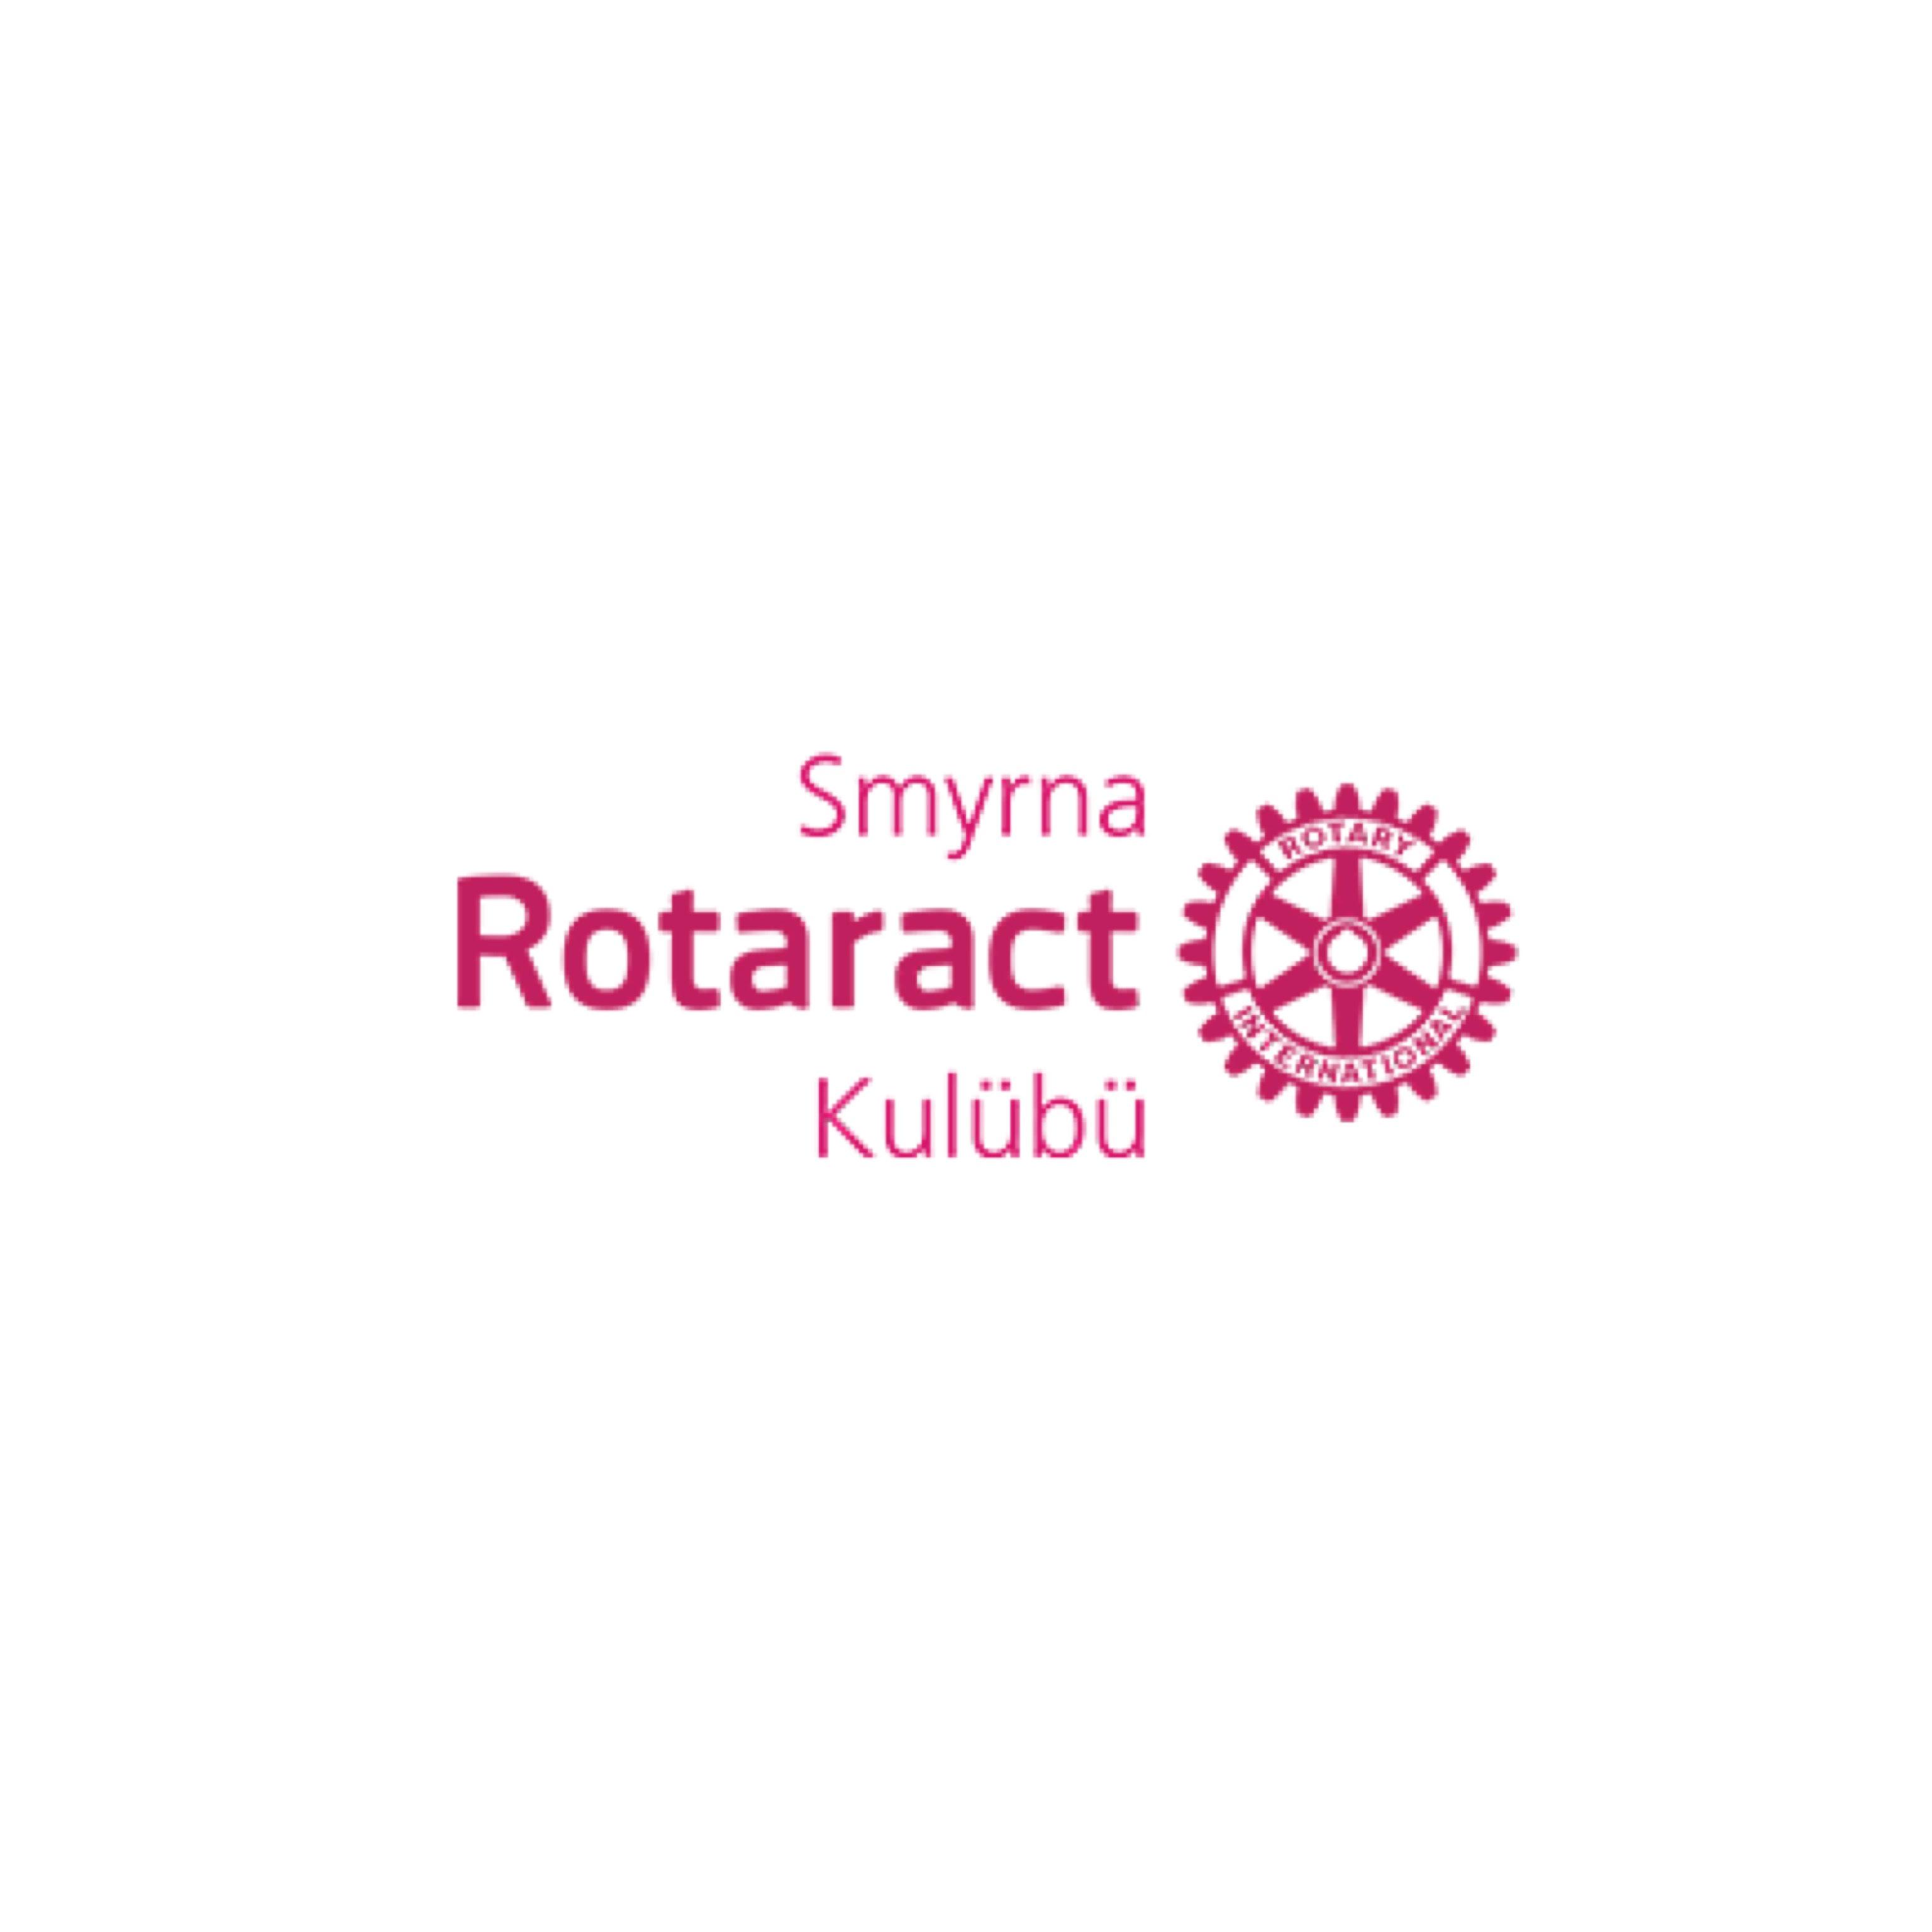 Smyrna Rotaract Kulübü